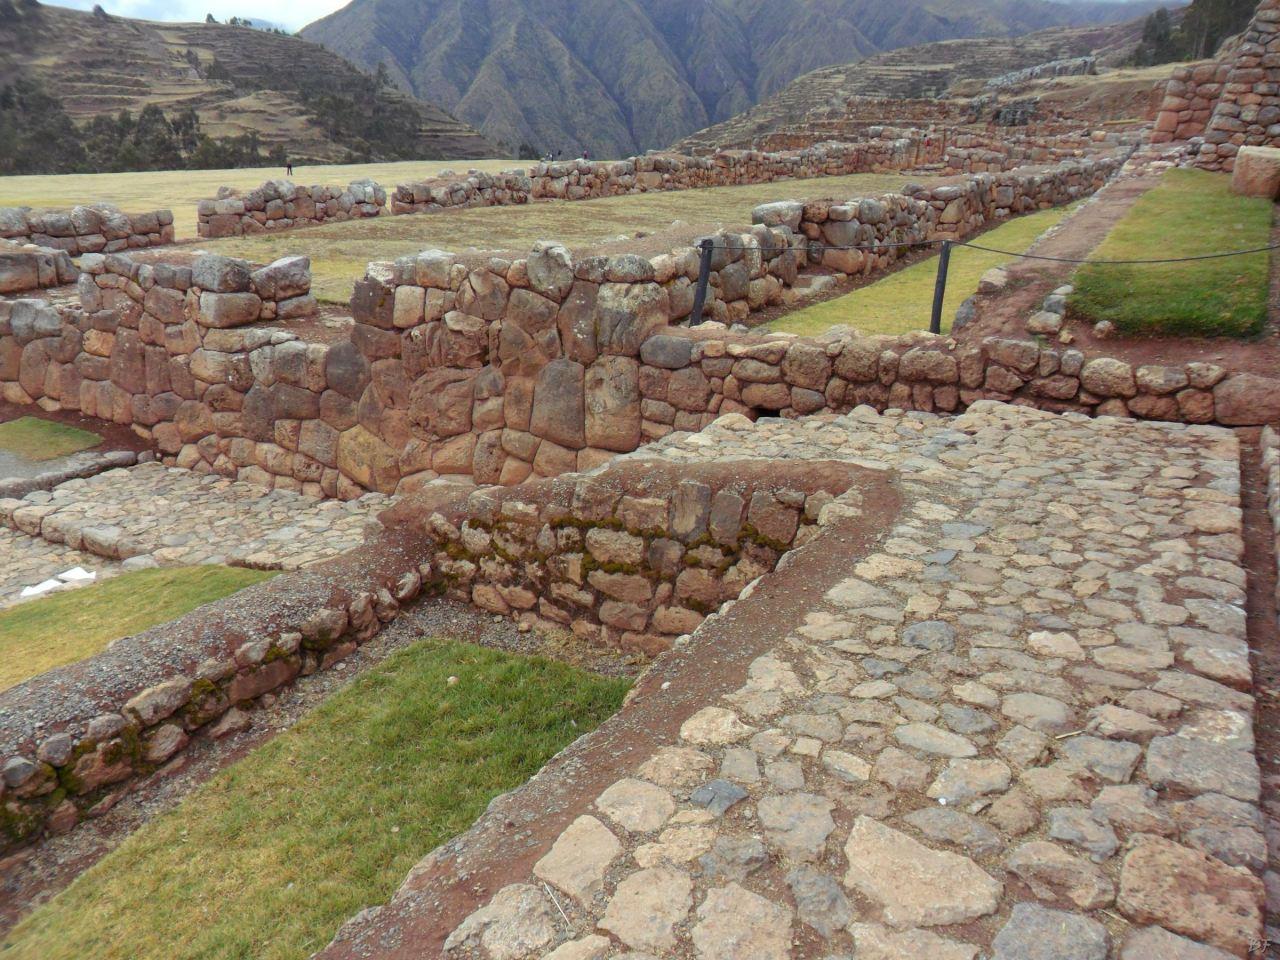 Chinchero-Mura-Poligonali-Piramide-Urubamba-Peru-25